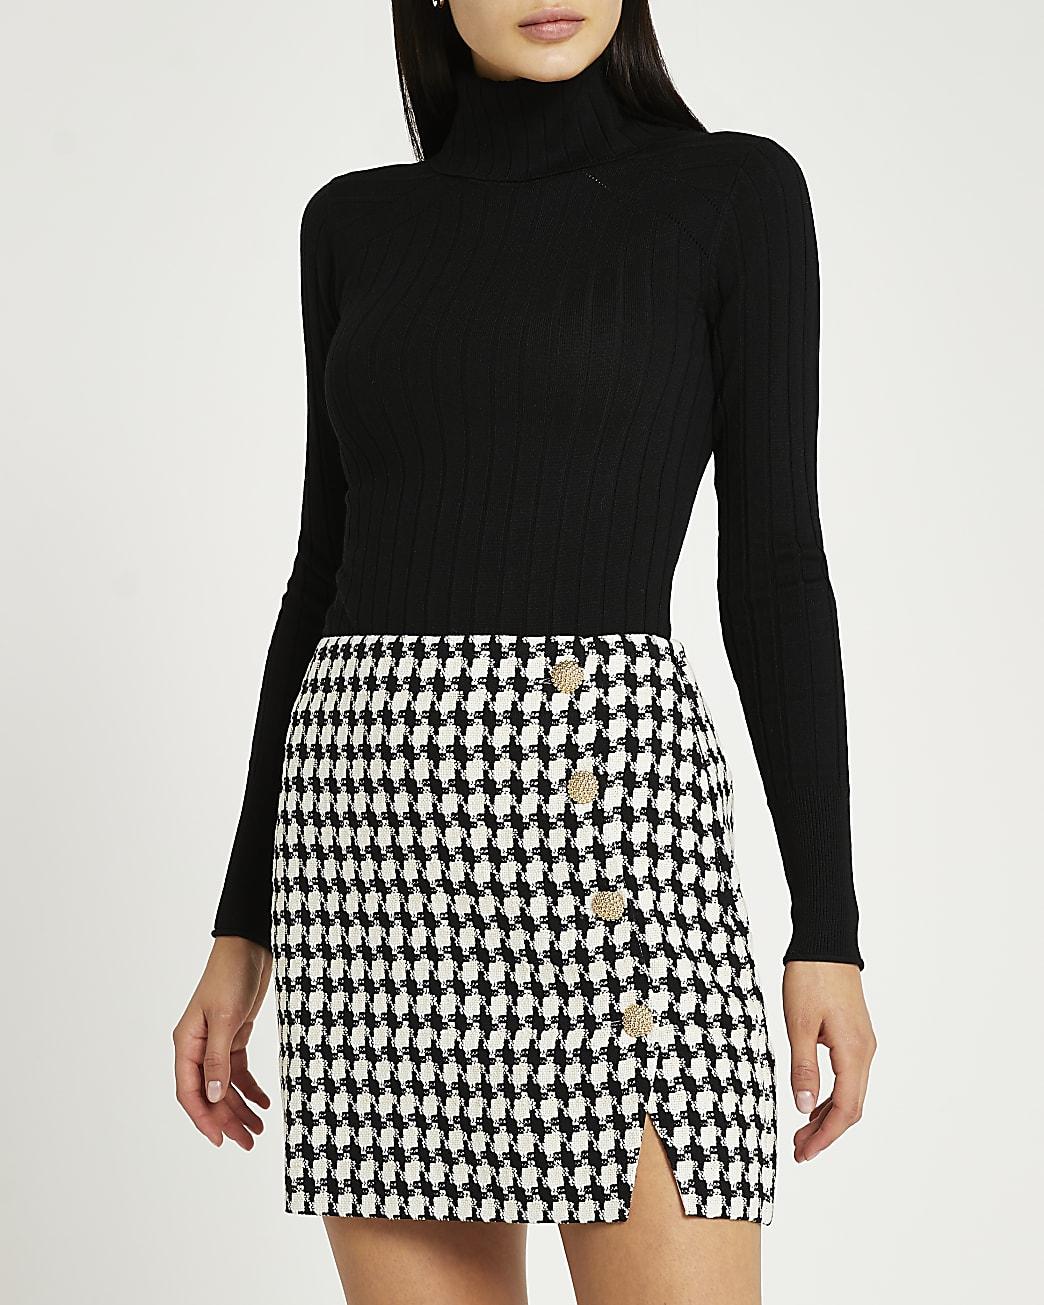 Black dogtooth boucle mini skirt